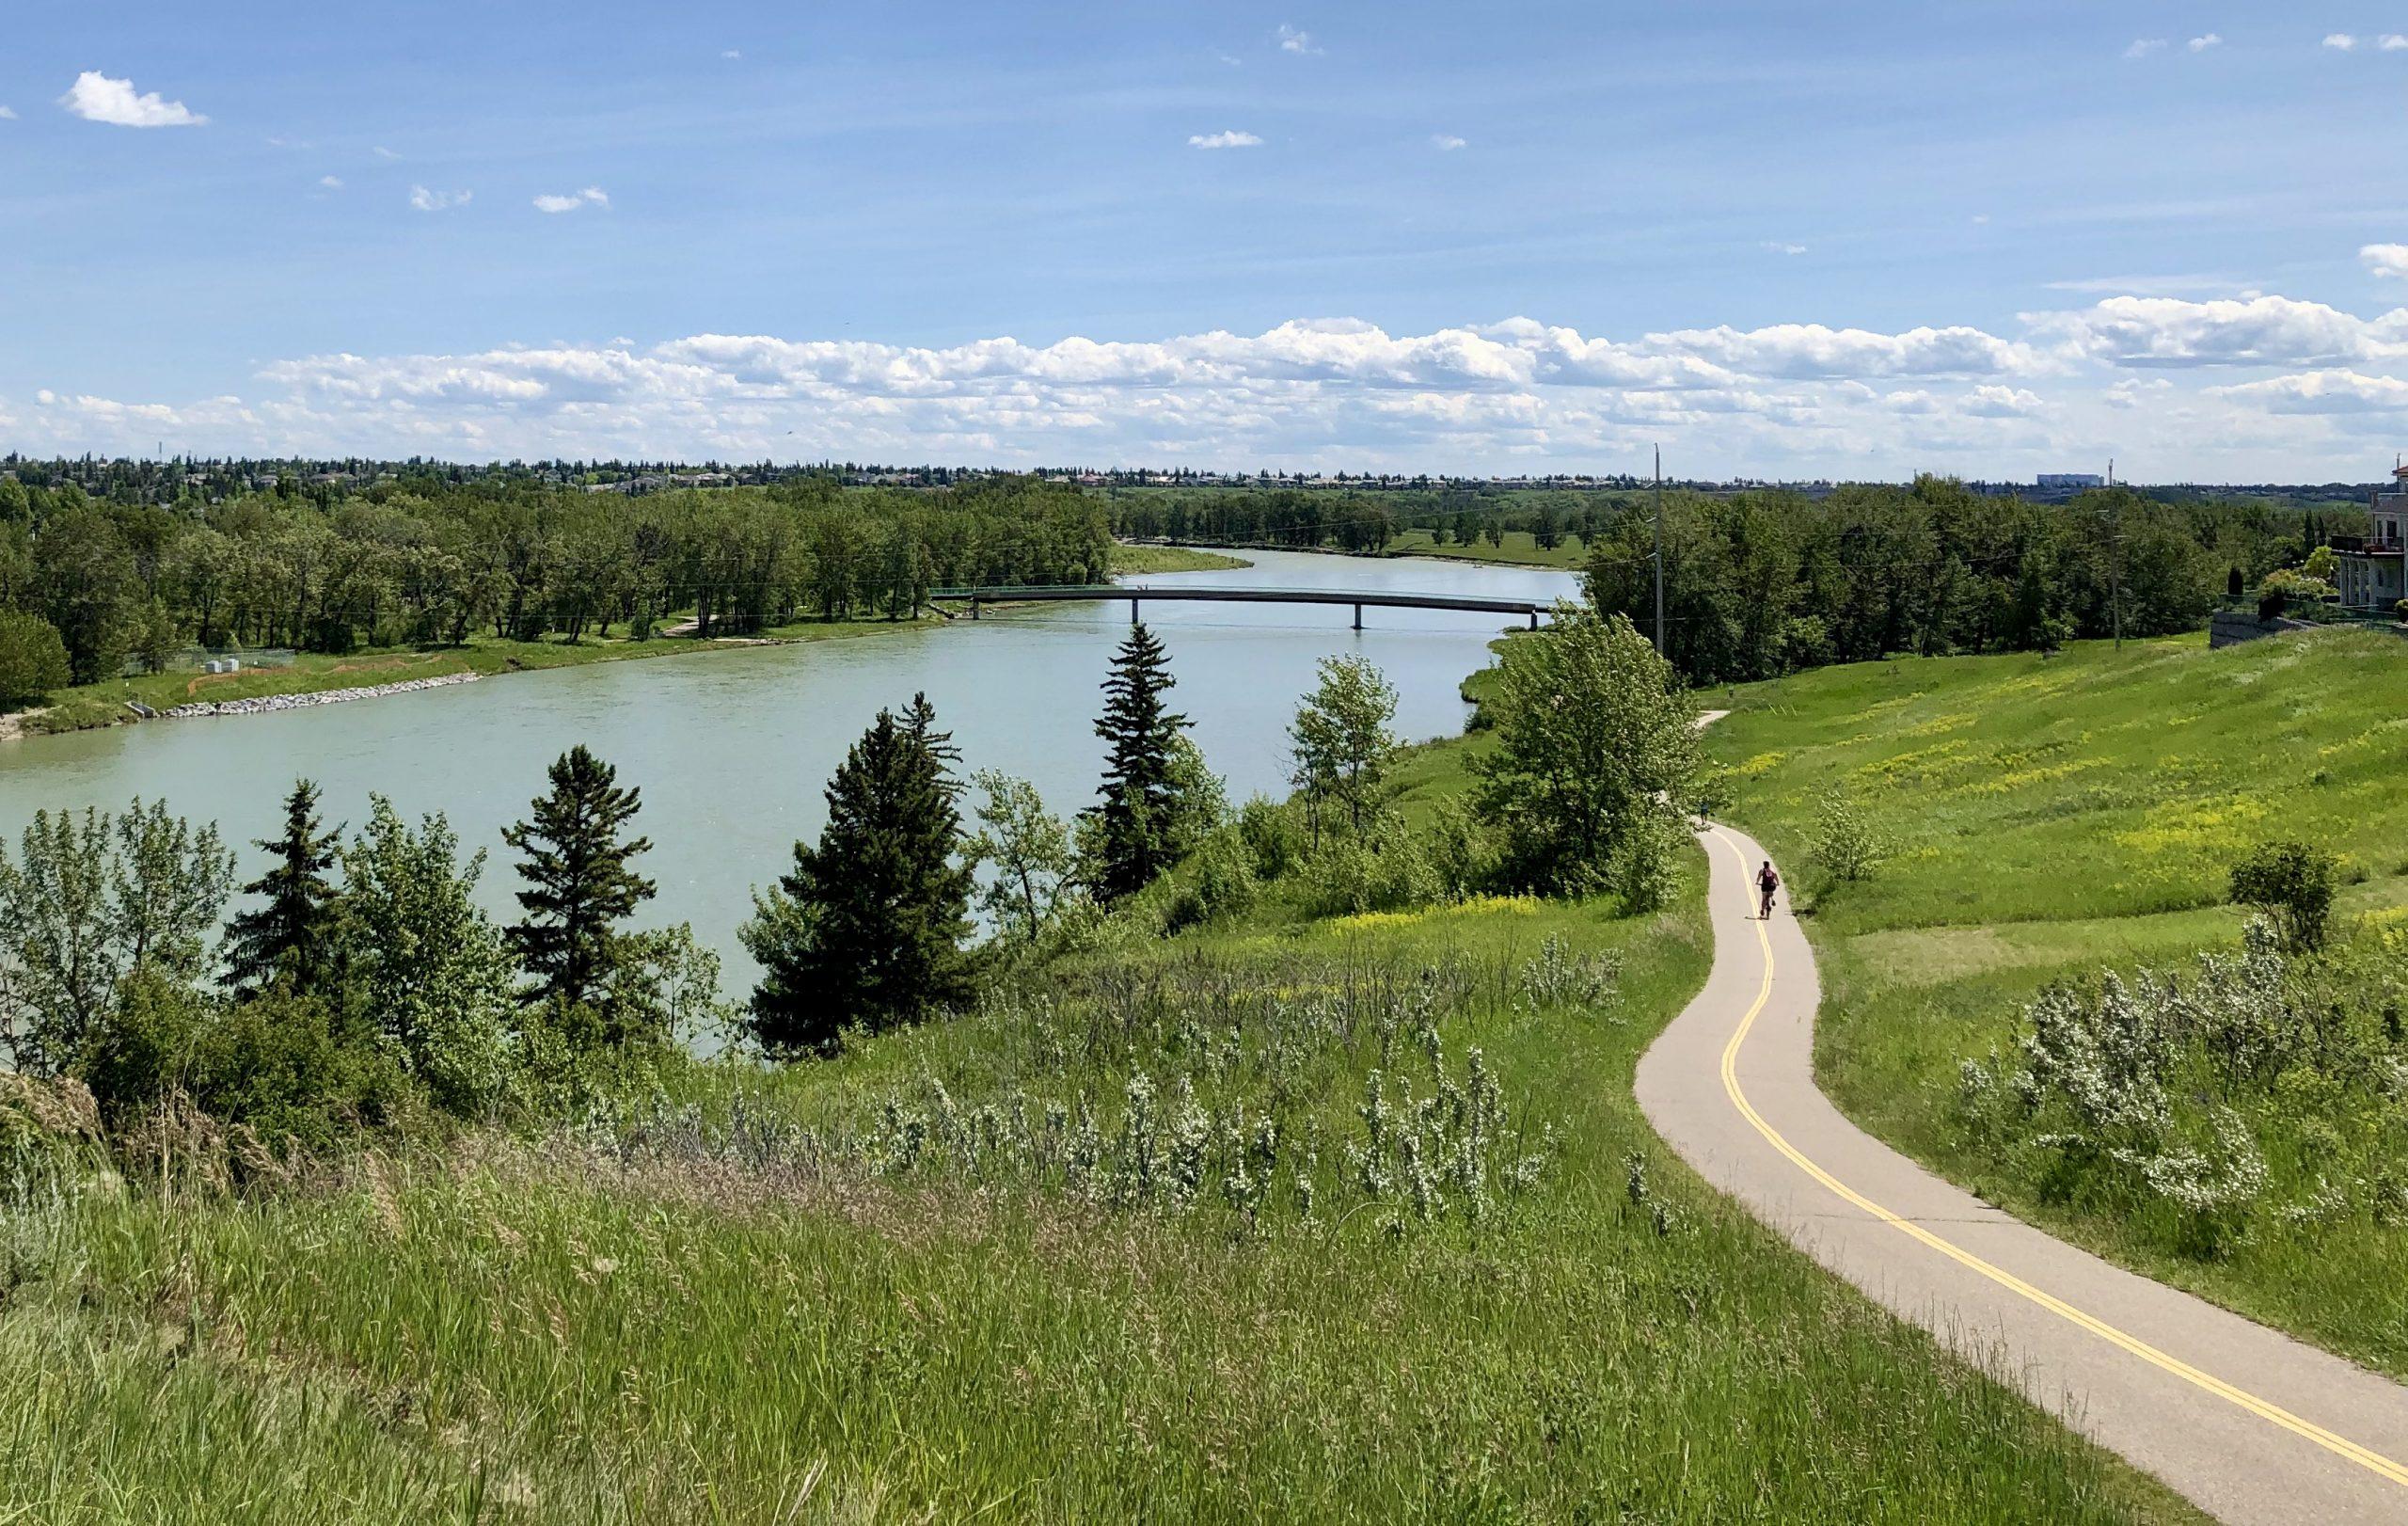 5 of the Best Bike Paths in Calgary, Alberta via @outandacross